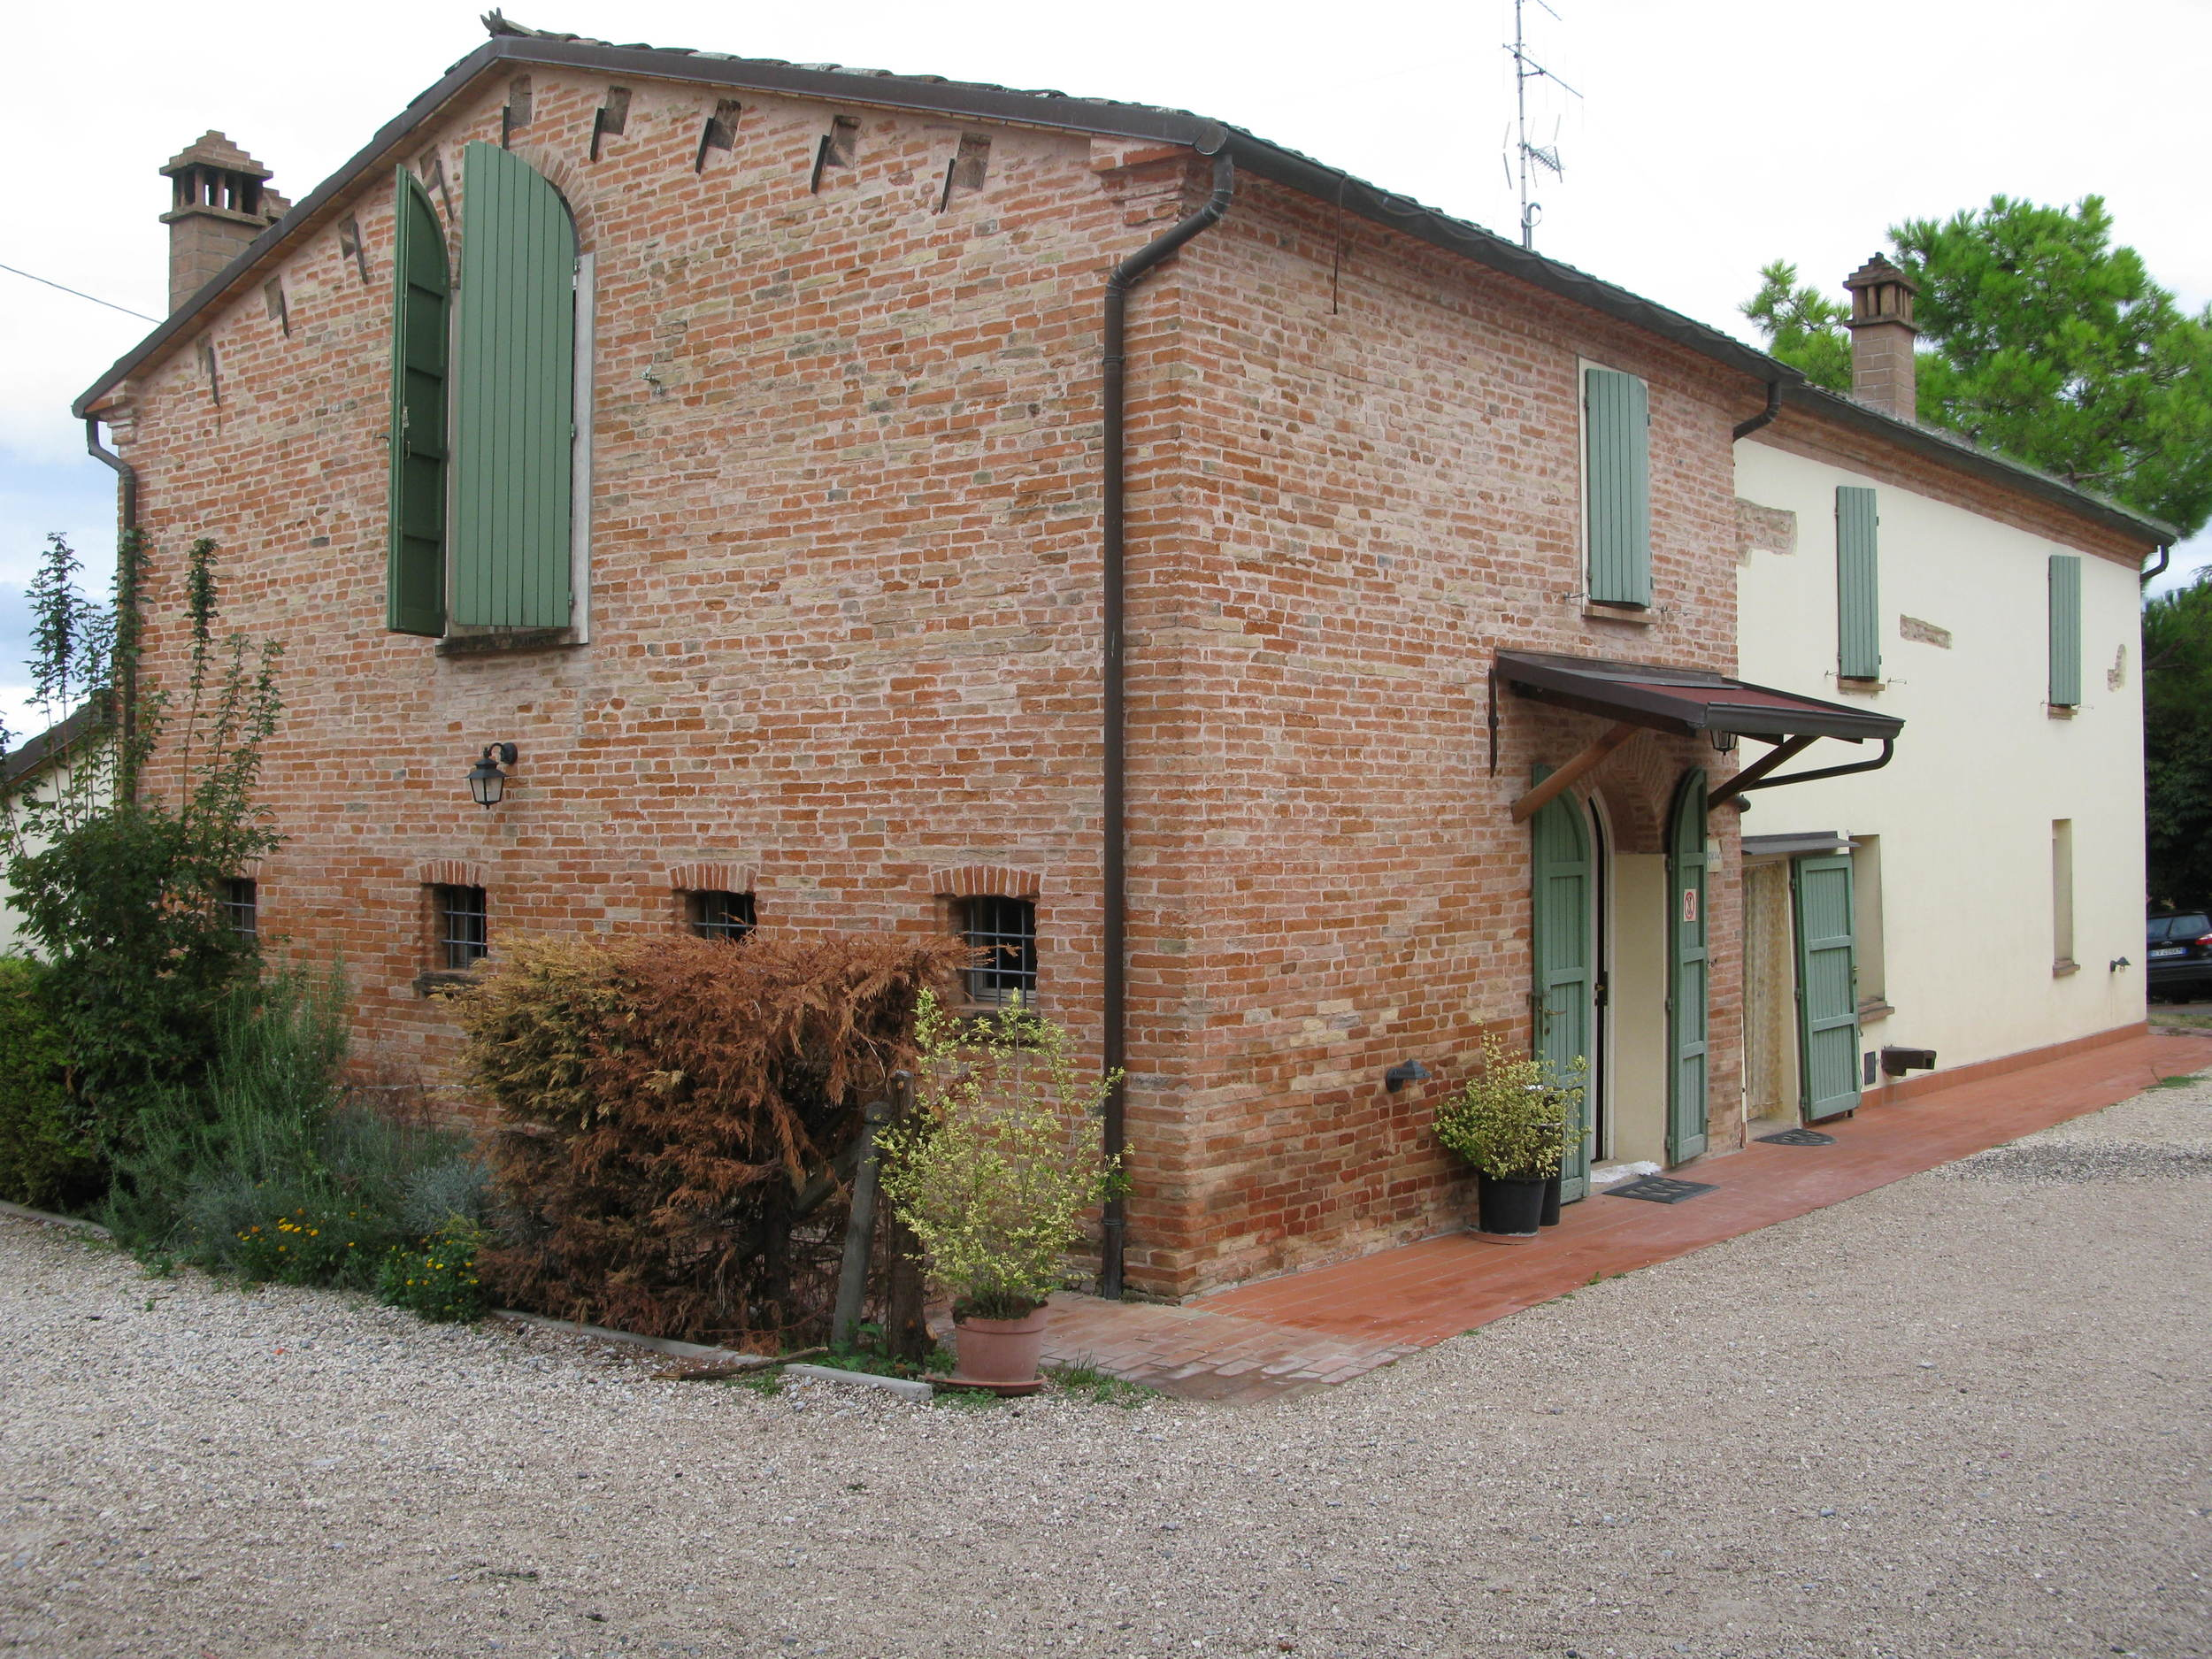 The farmhouse at La Sabbiona